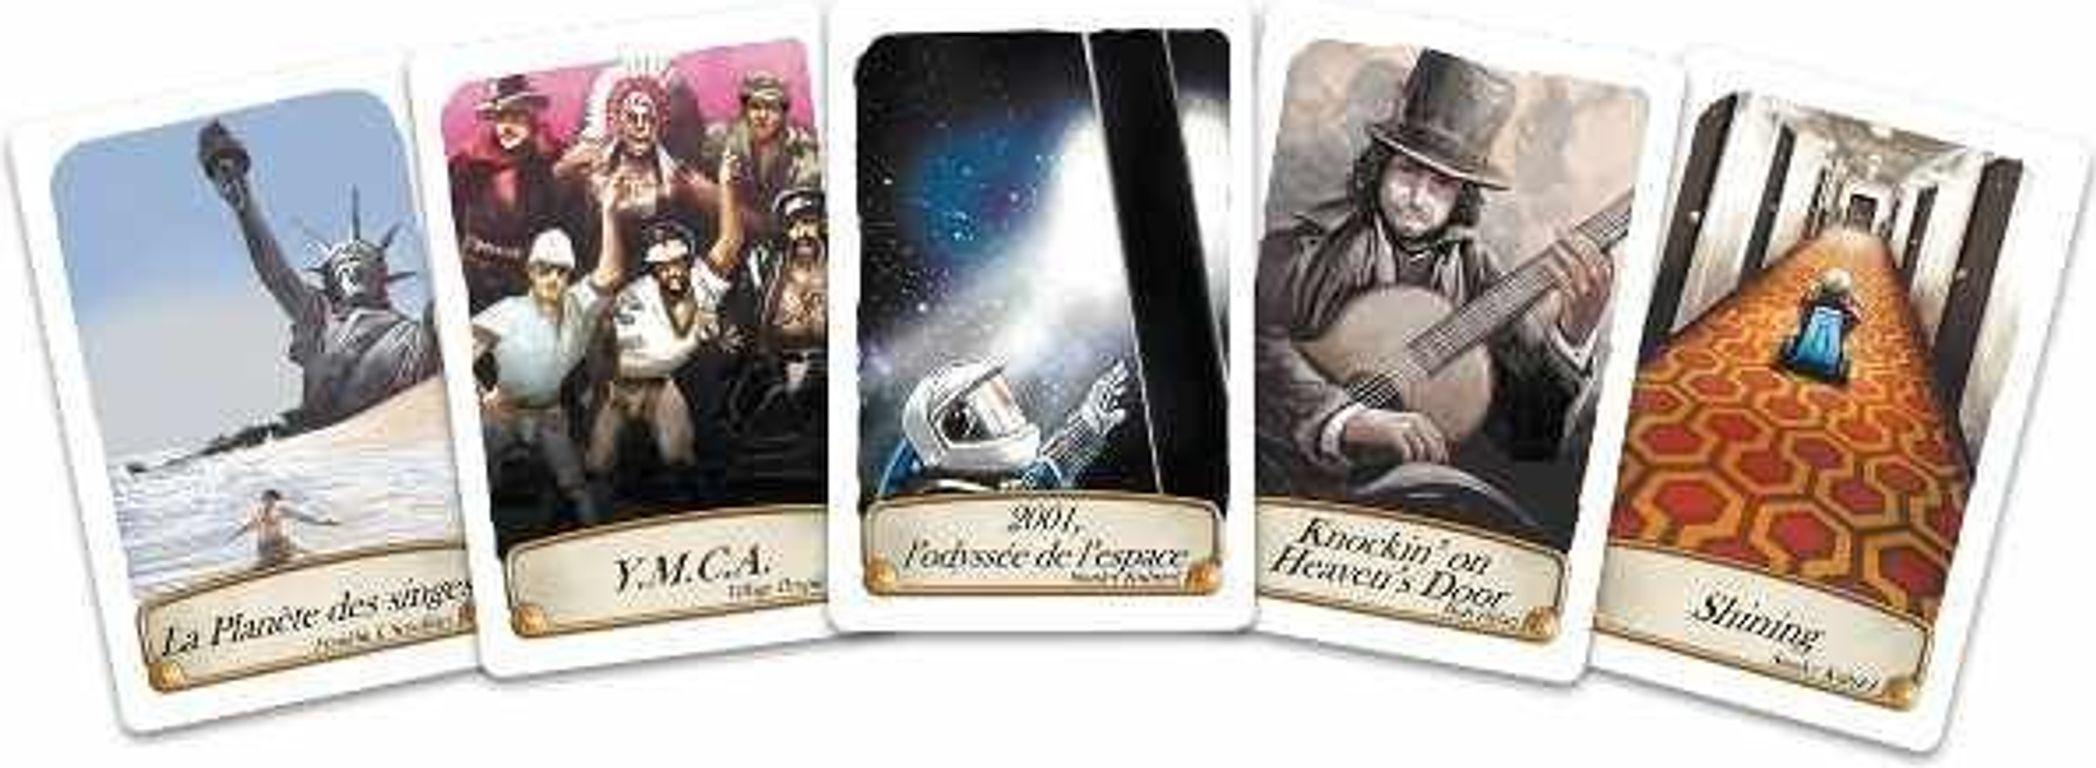 Timeline: Music & Cinema cards